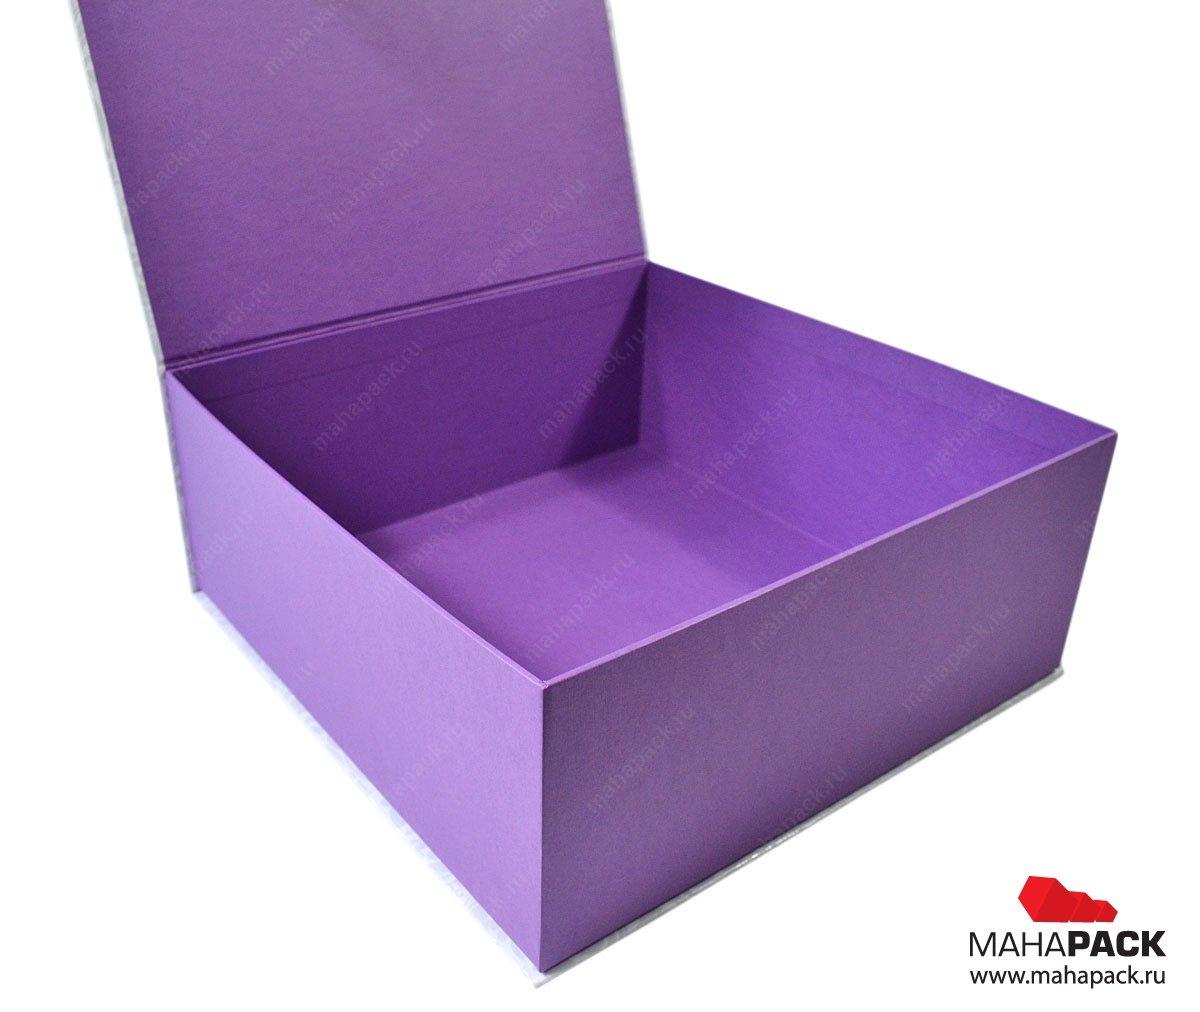 Фирменная коробка с клапаном на магните